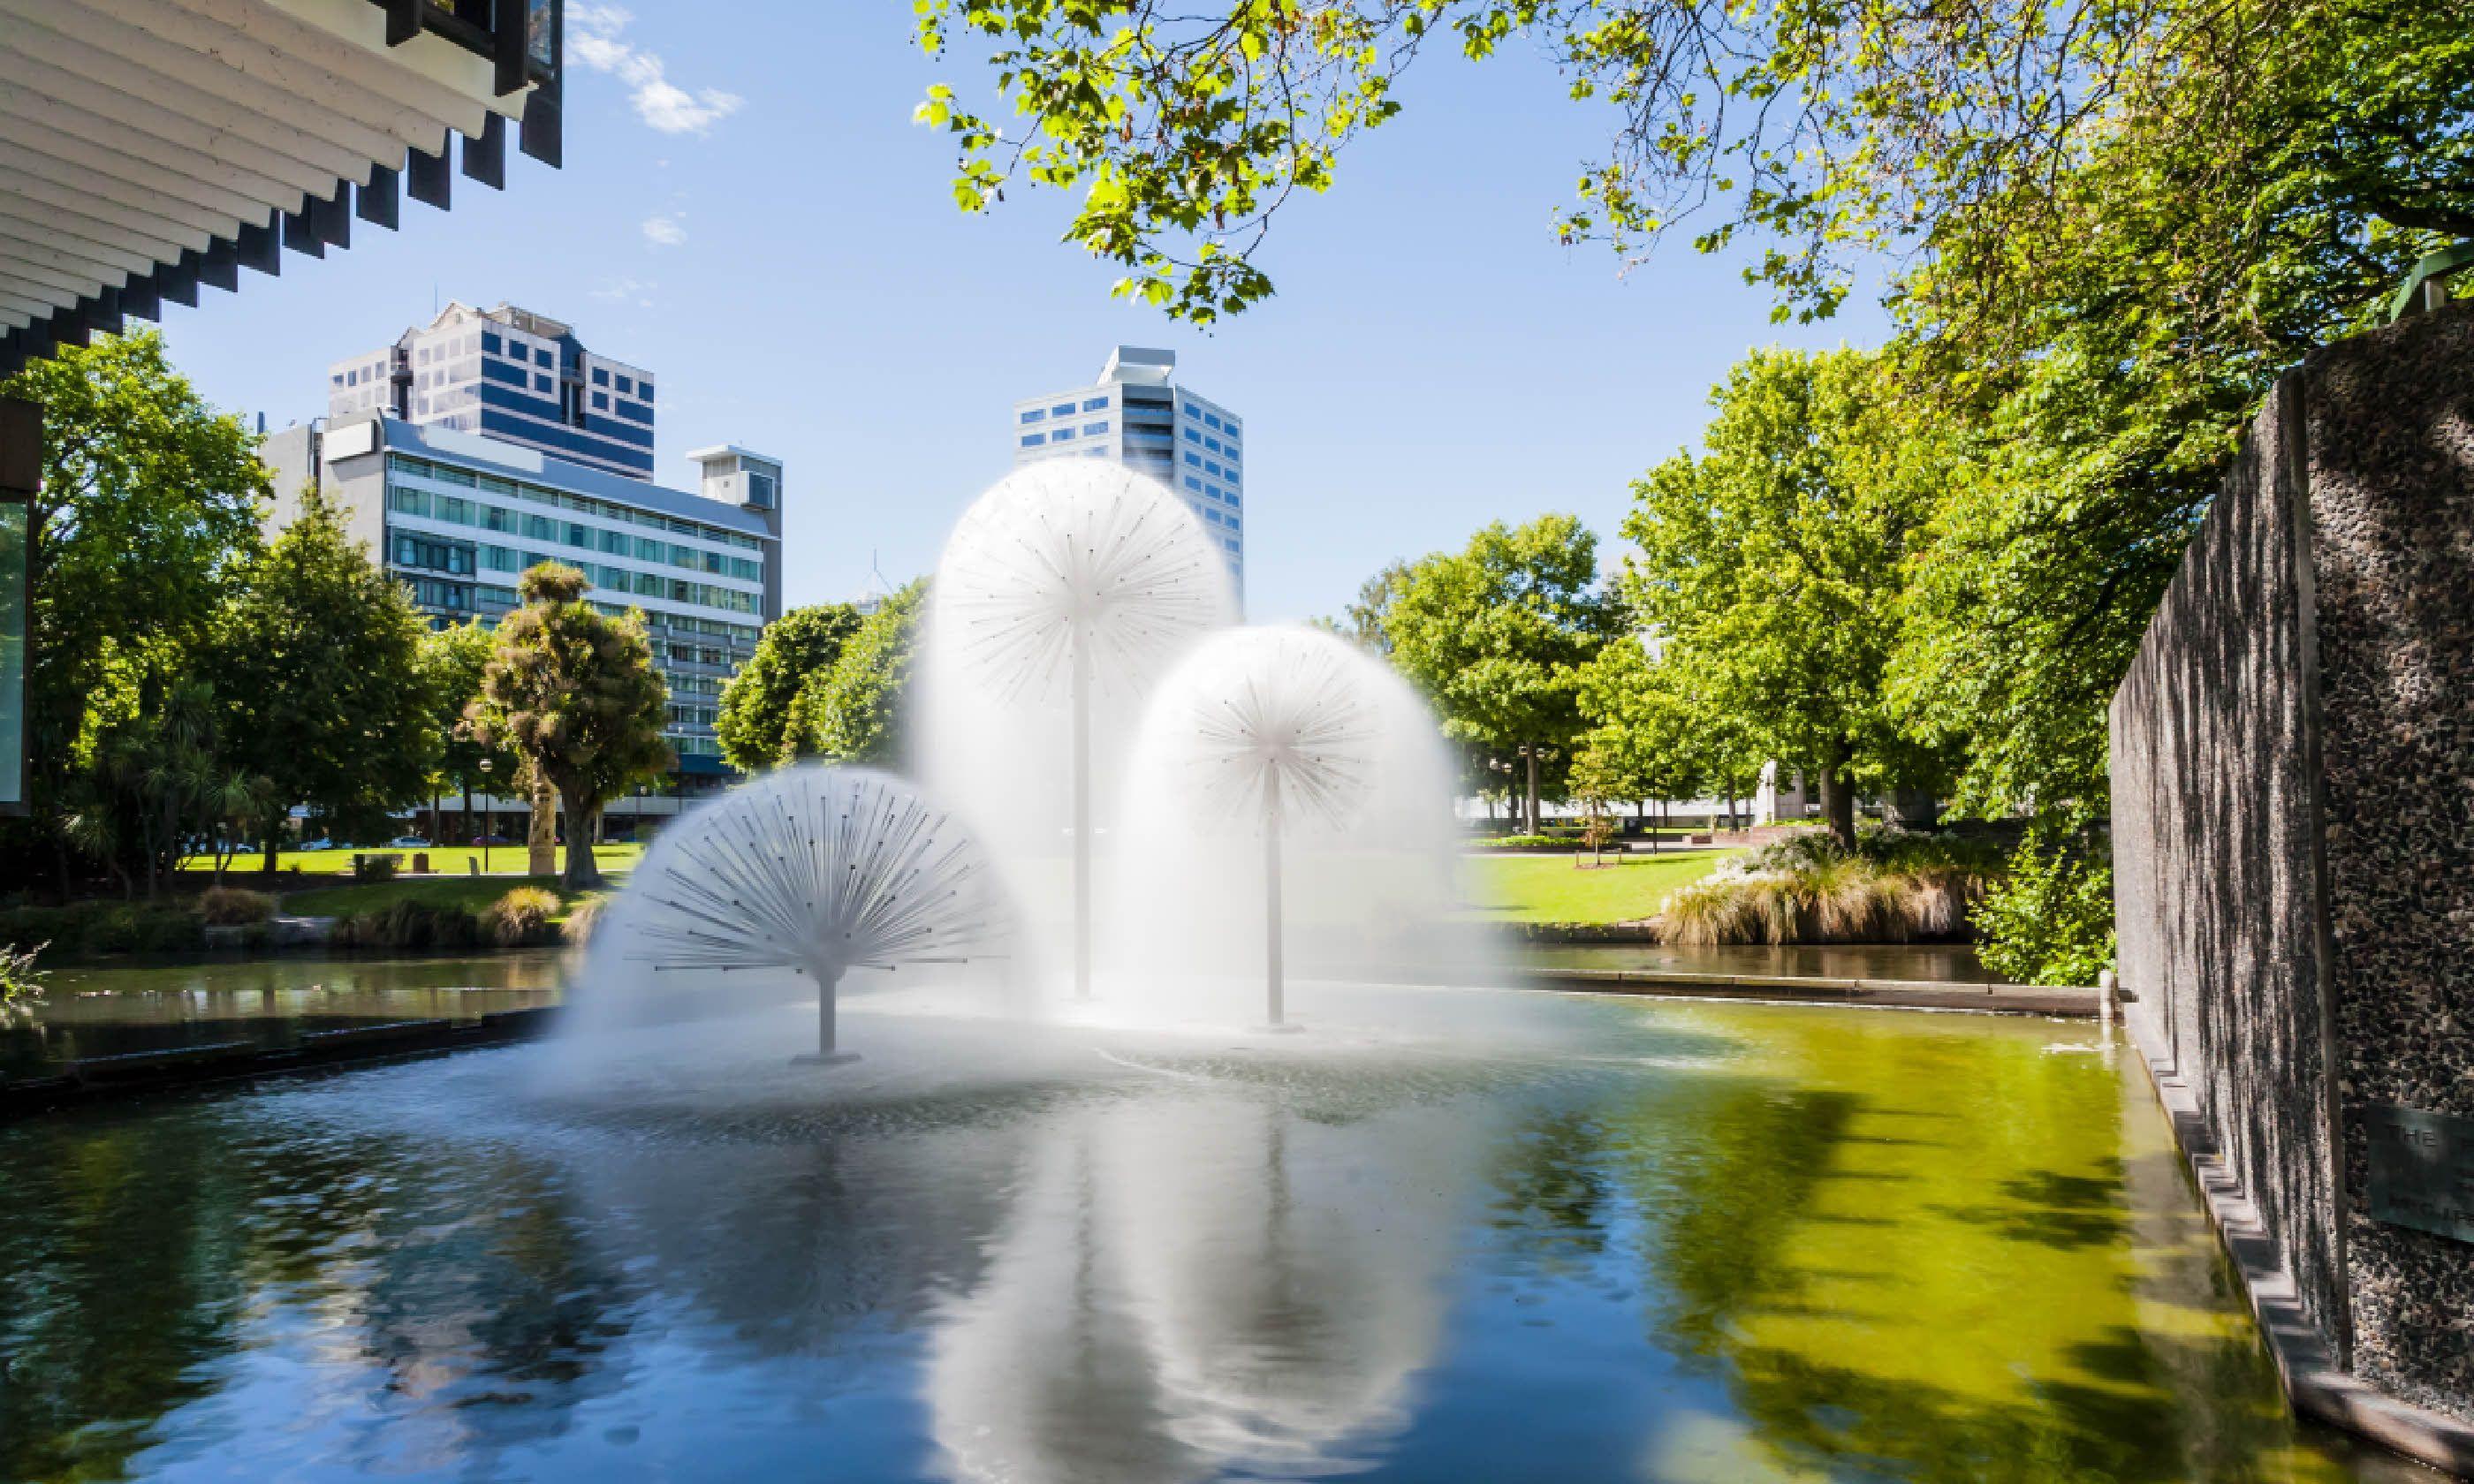 The Ferrier Fountain, Victoria Square, Christchurch (Shutterstock)